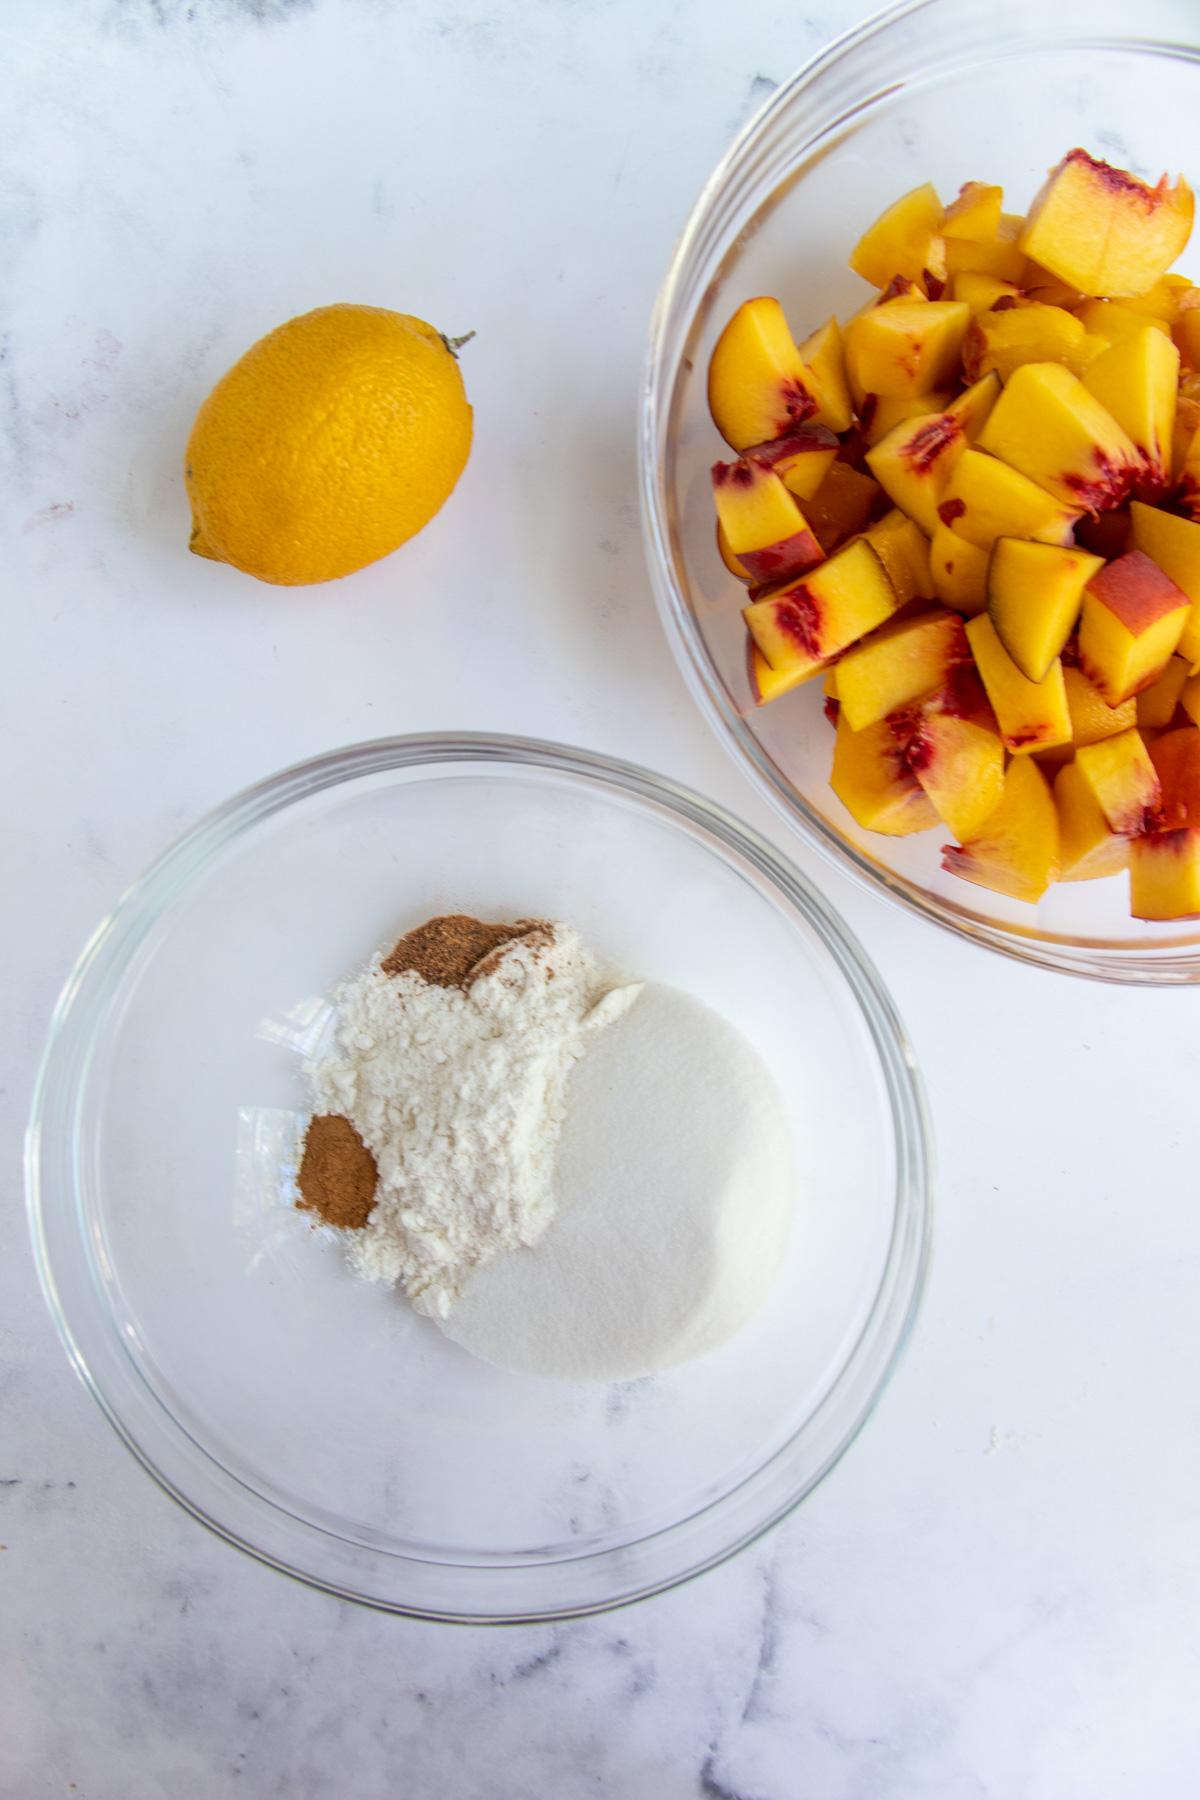 Bowl of peaches and a bowl of flour, sugar, cinnamon and nutmeg